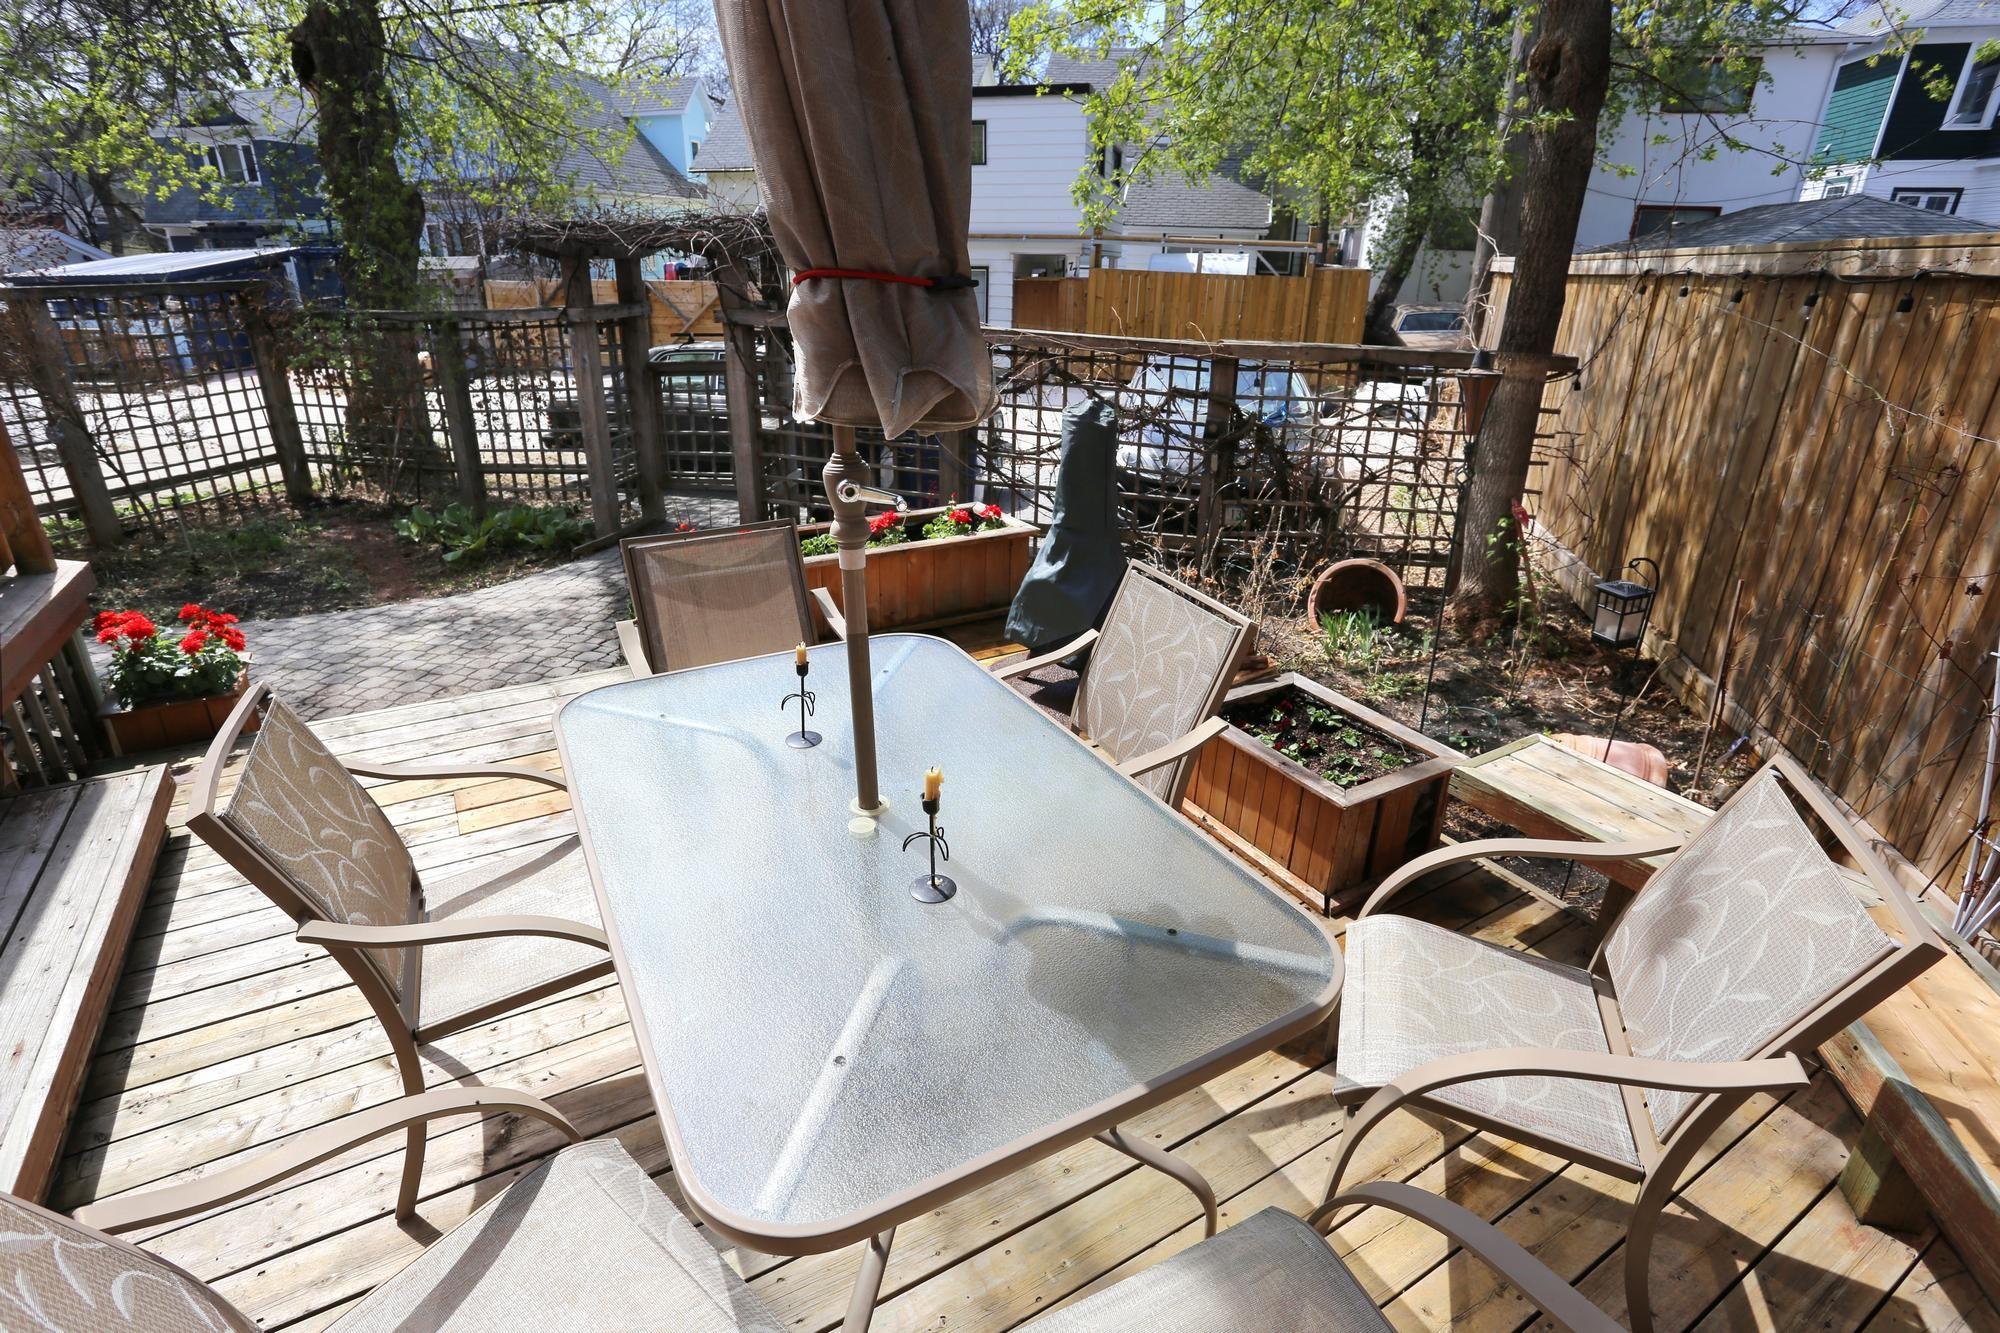 Photo 34: Photos: 96 Home Street in Winnipeg: Wolseley Single Family Detached for sale (5B)  : MLS®# 1810985